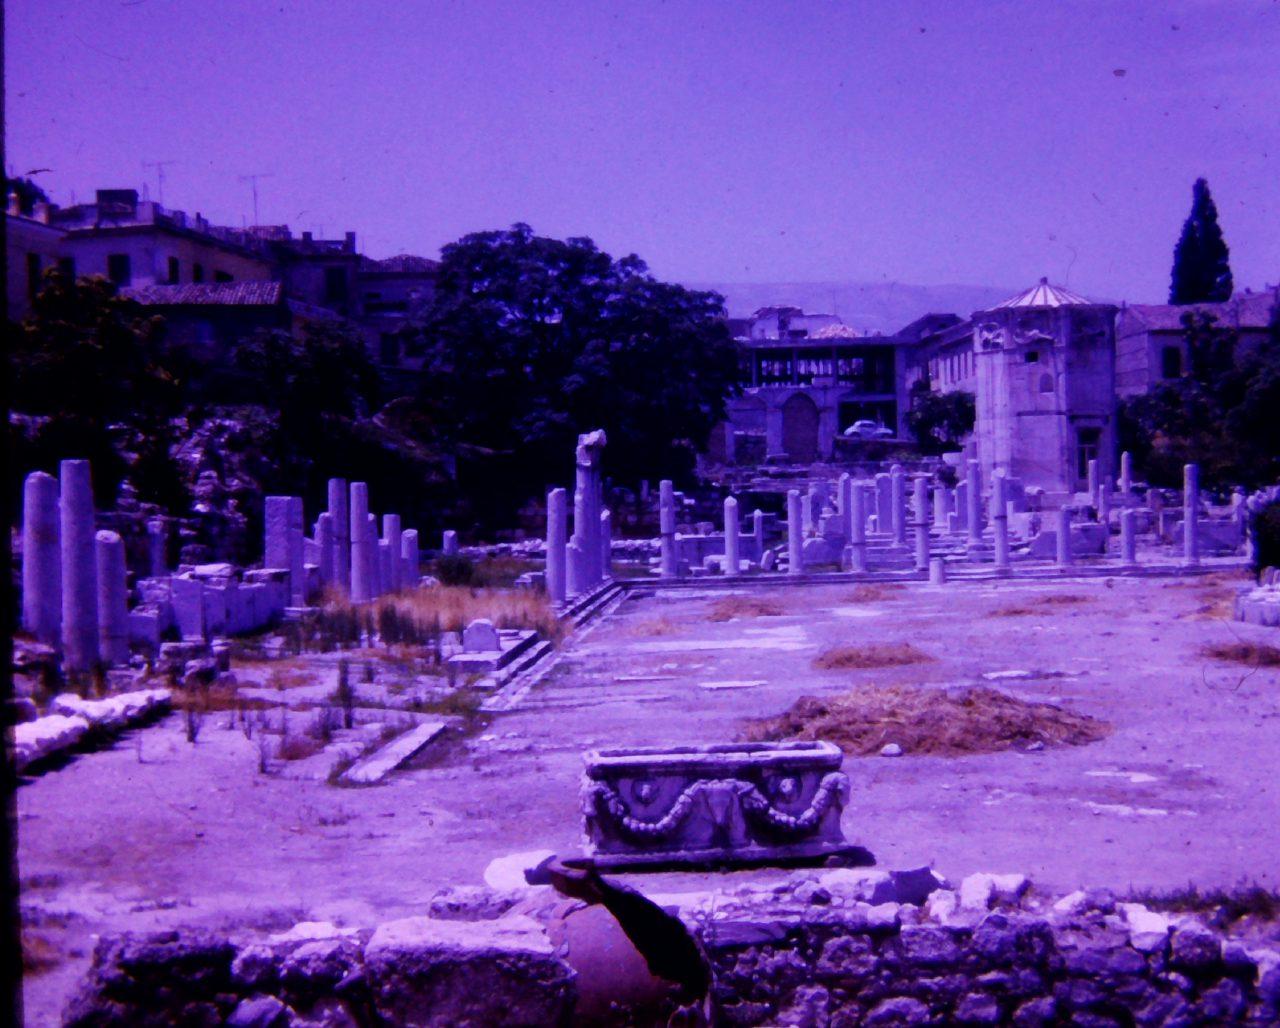 Ruinen Kreta, aus Familienbesitz, kasaan media, 2019